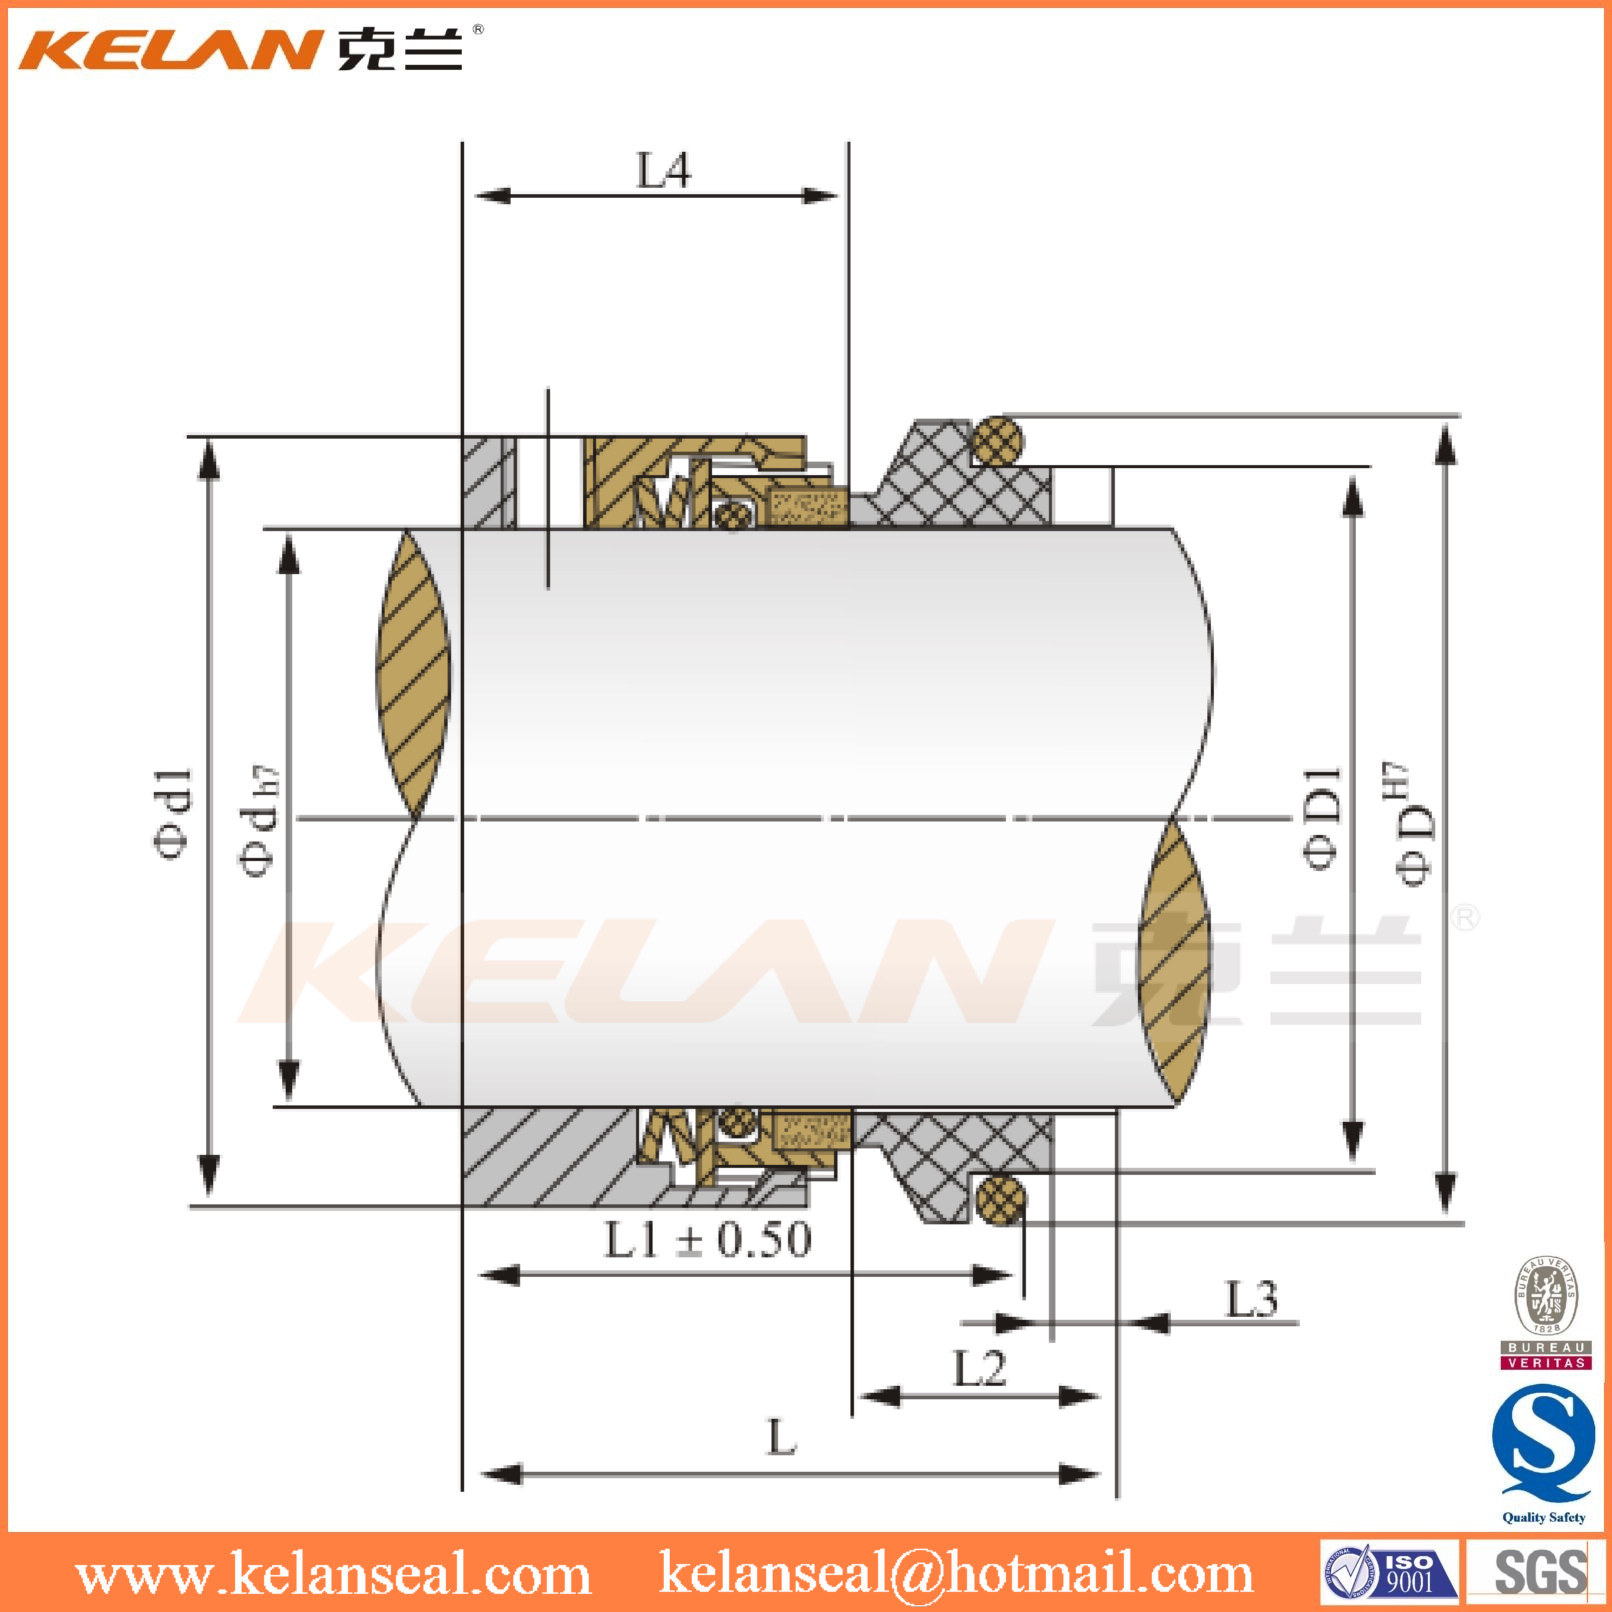 centrifugal pump mechanical seal diagram wiring legend china eagle burgmann m7n for klm7n 155